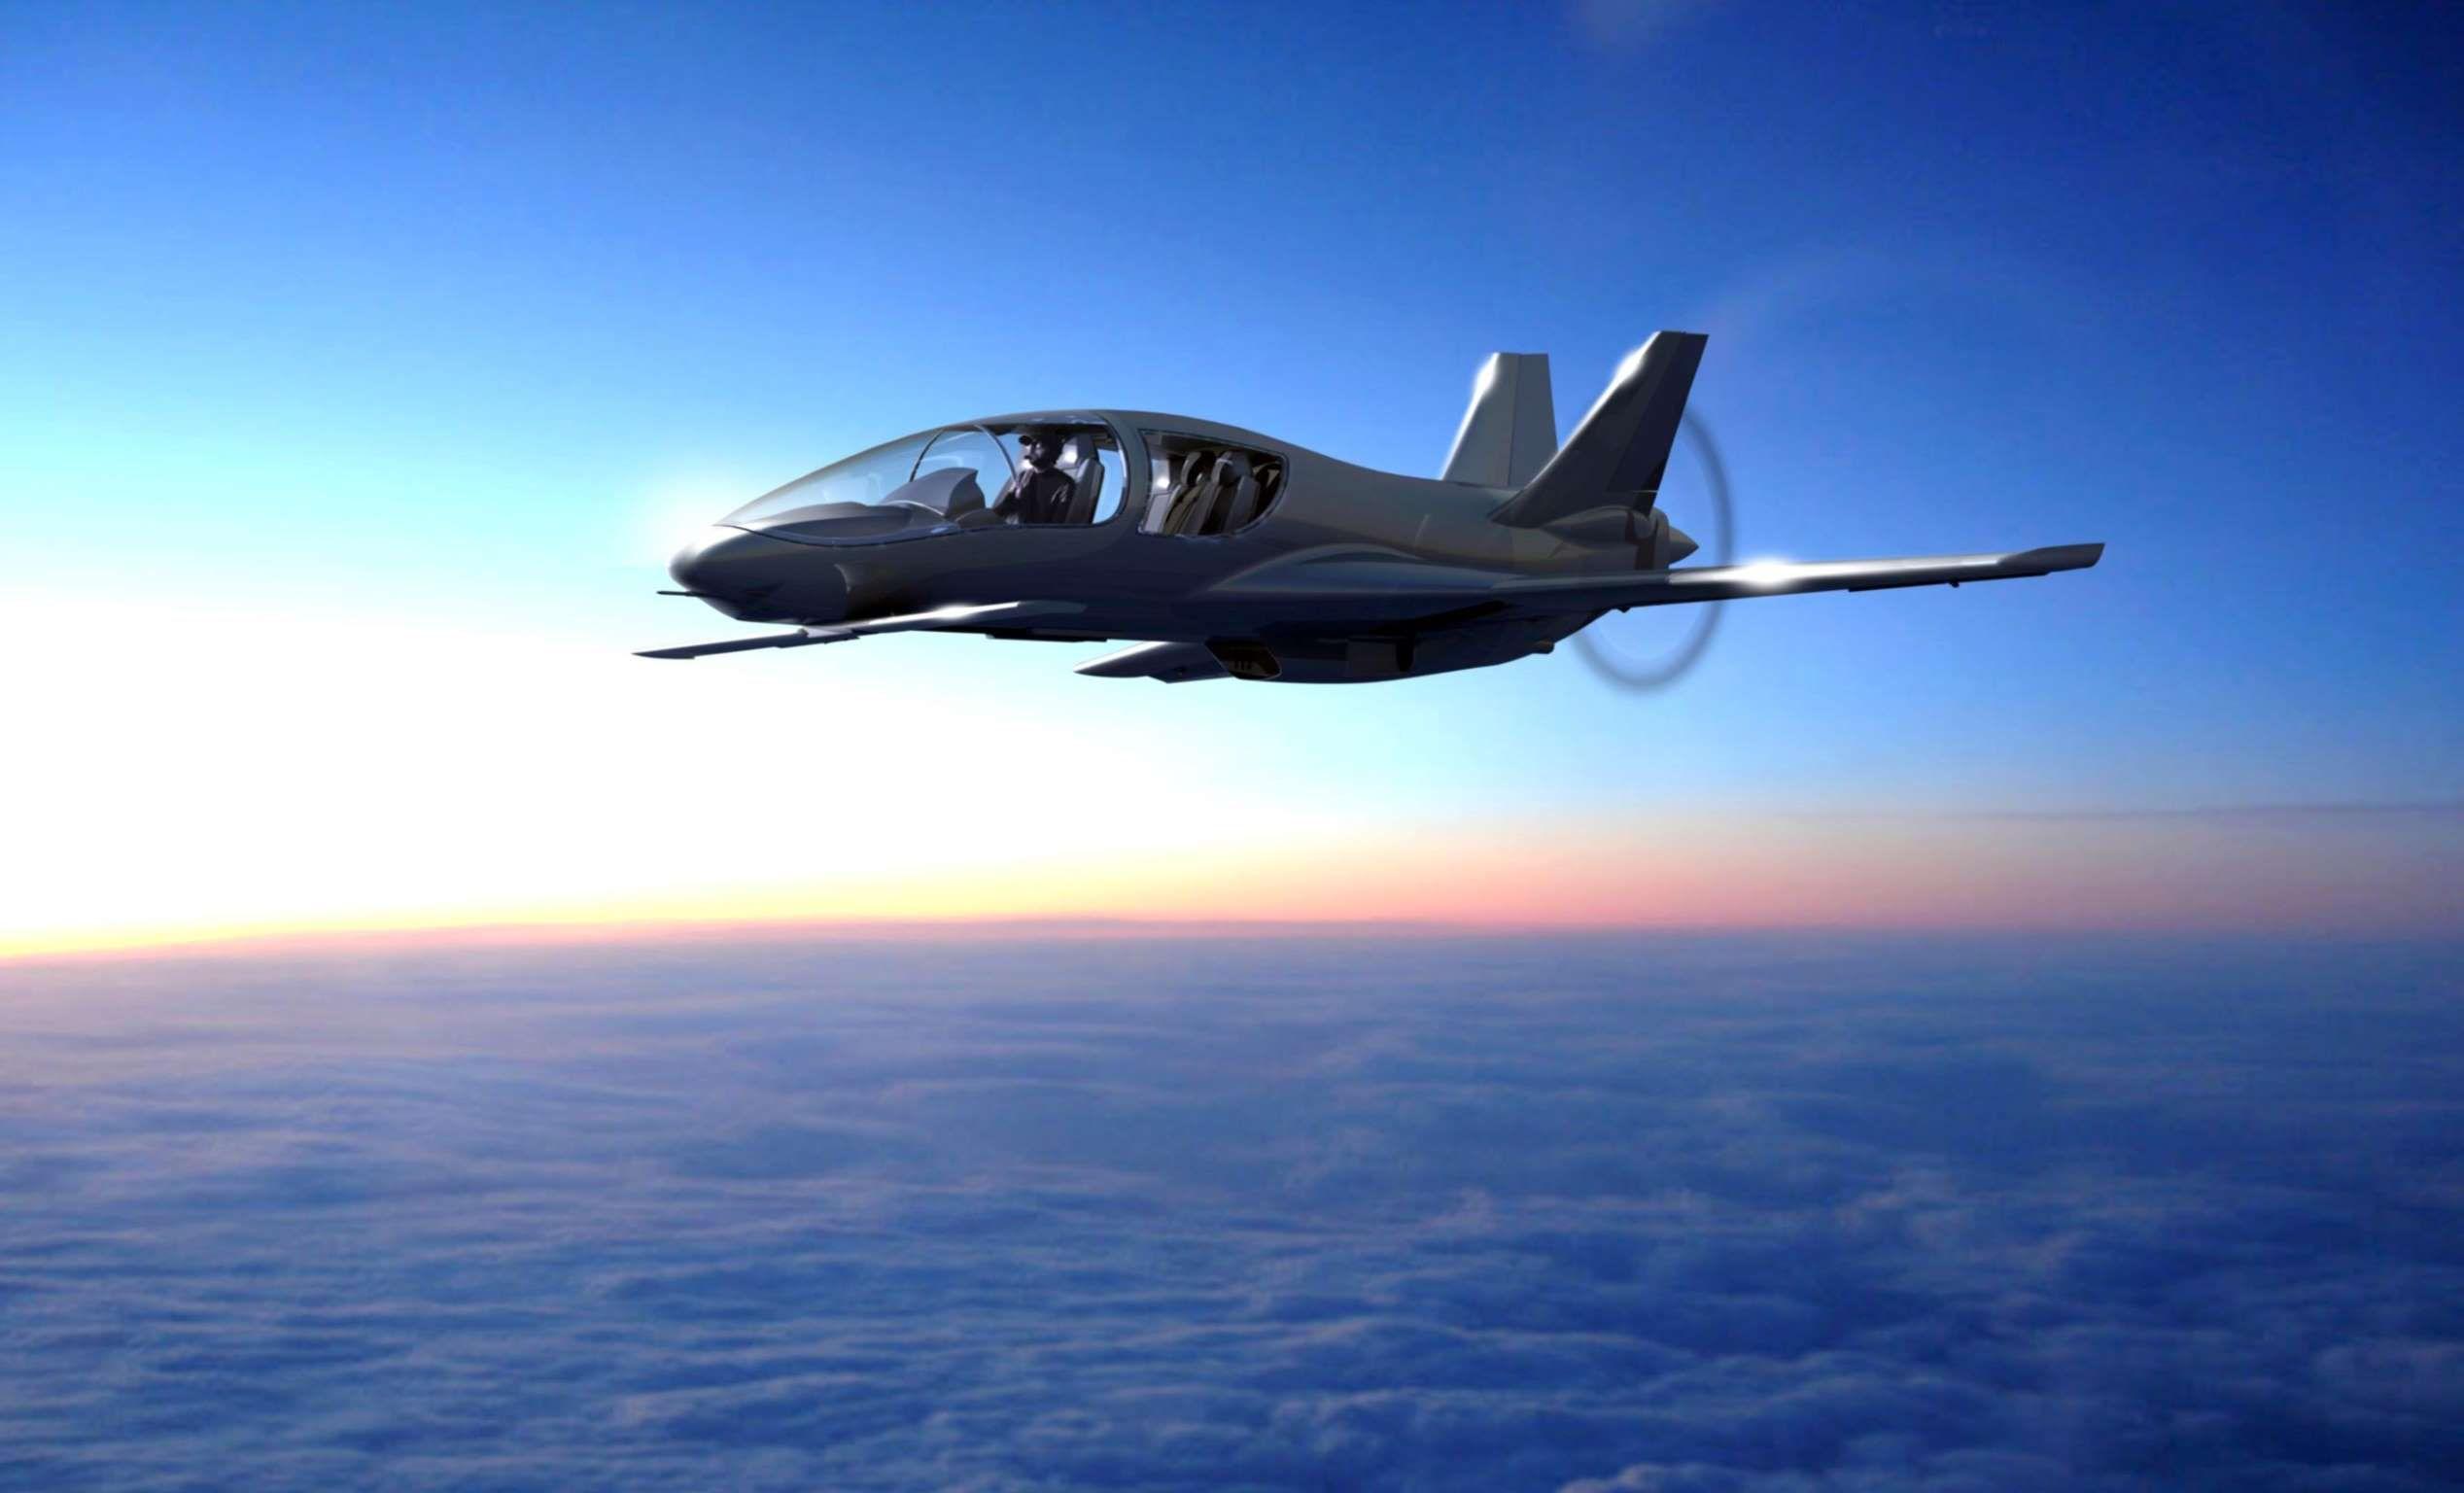 Valkyrie airplane - Sabrina Bot/REX Shutterstock/Rex Images